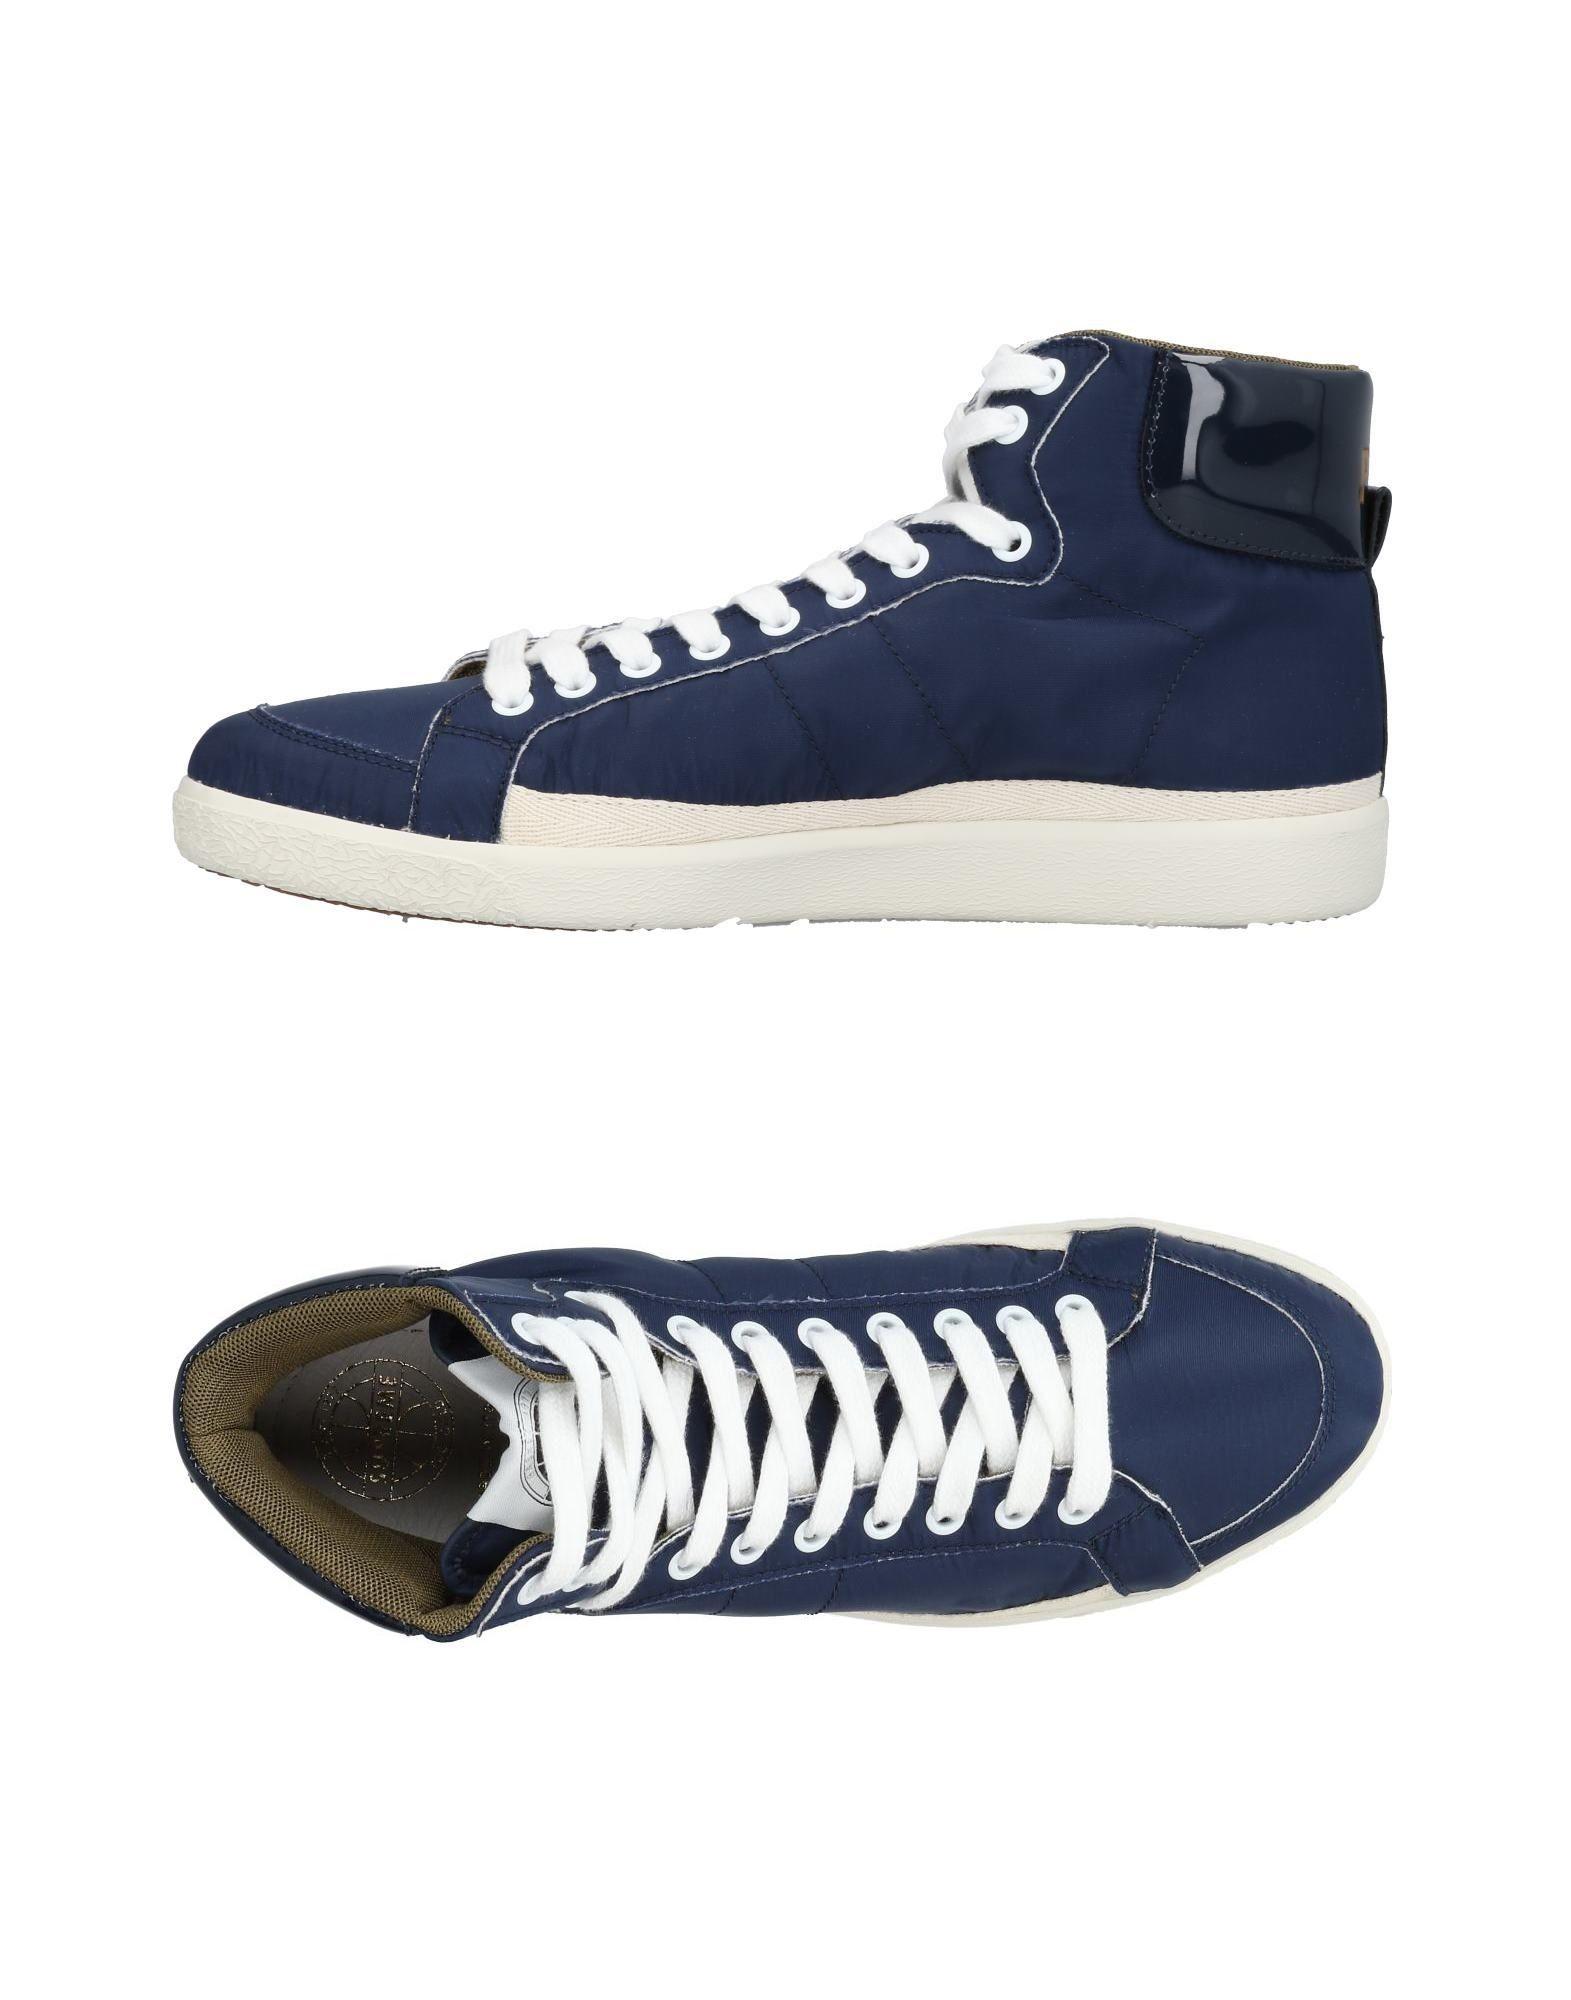 Pantofola D'oro Sneakers - Men on Pantofola D'oro Sneakers online on Men  Australia - 11456678WM d22a7e